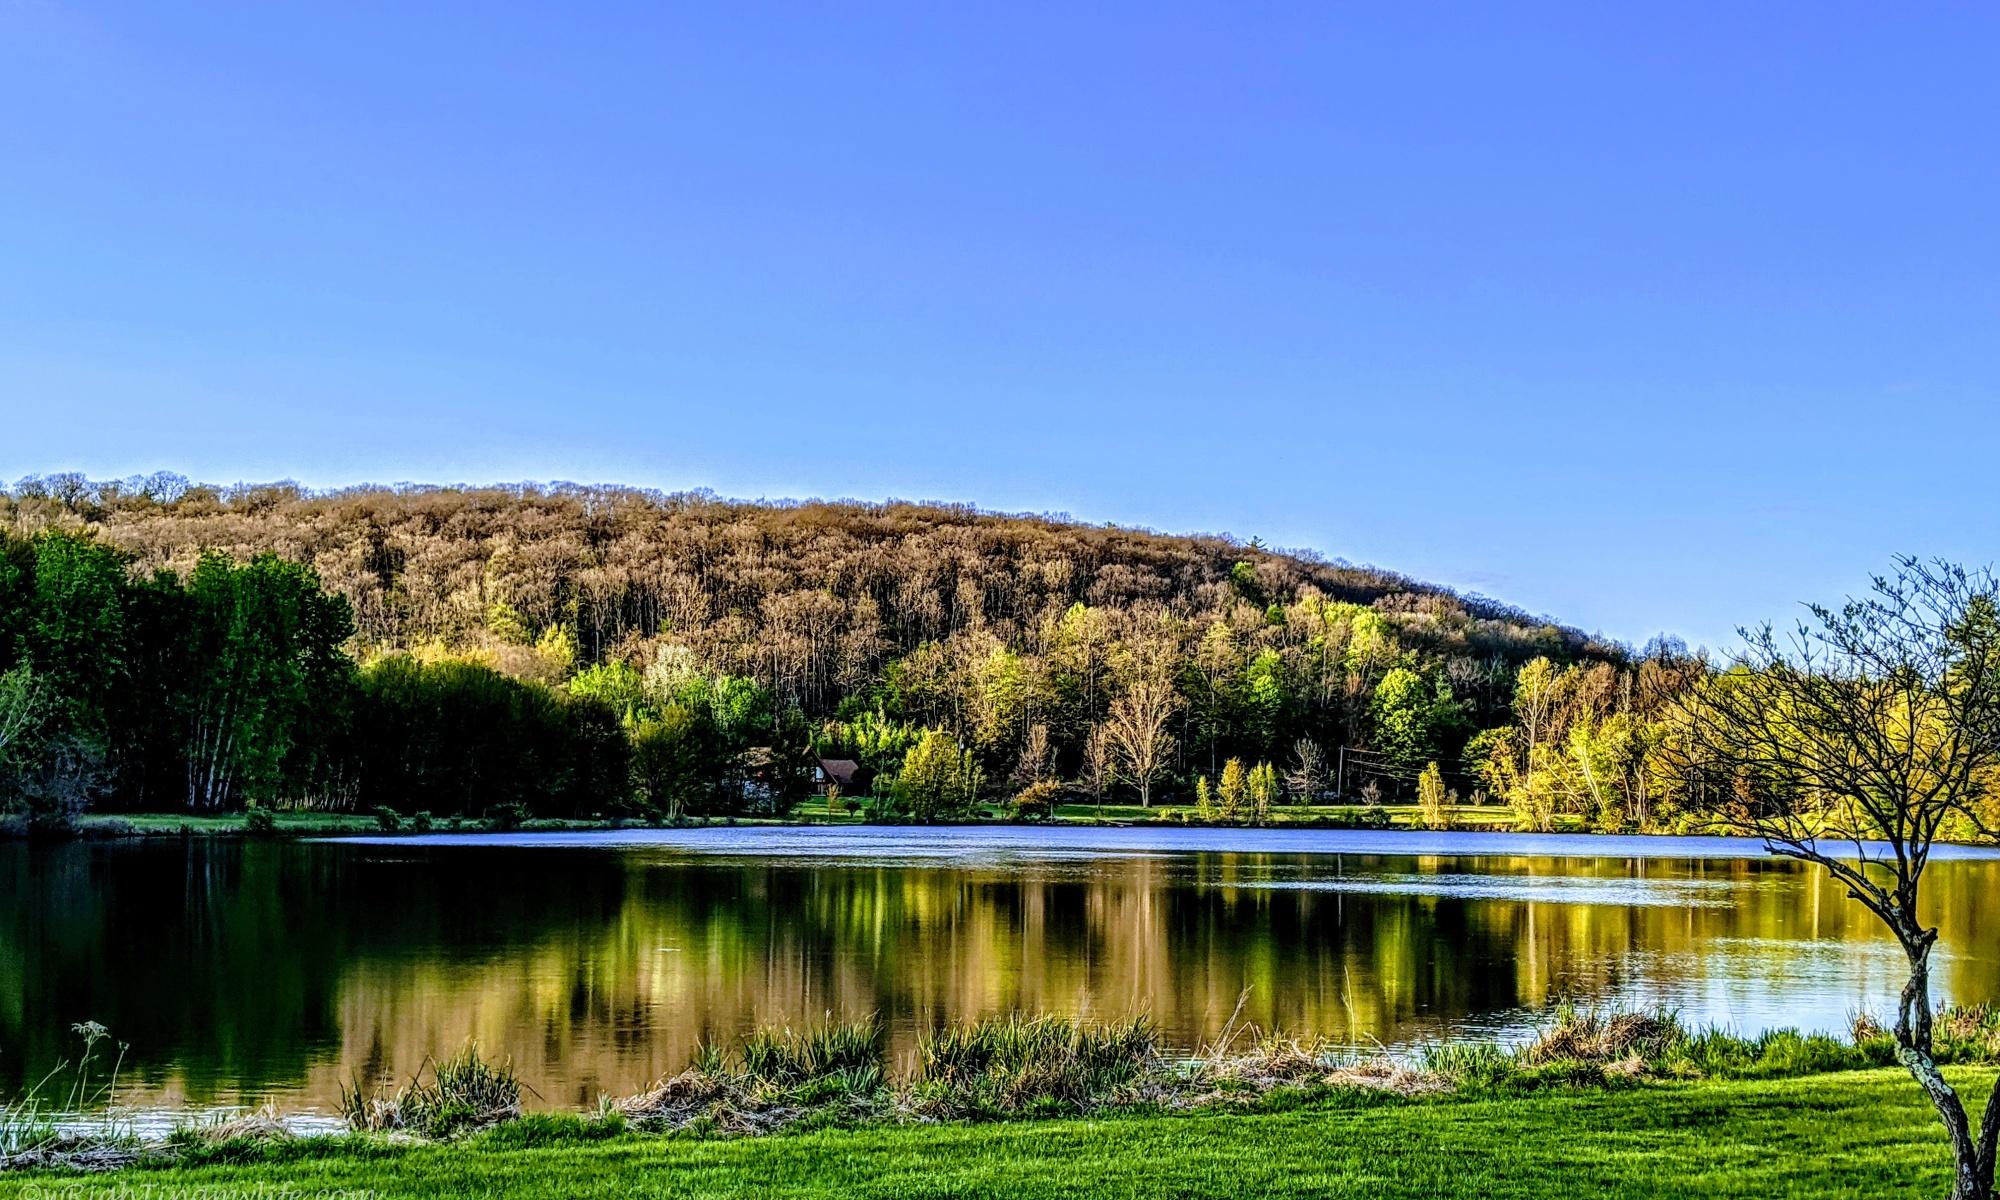 autumn trees vividly reflected